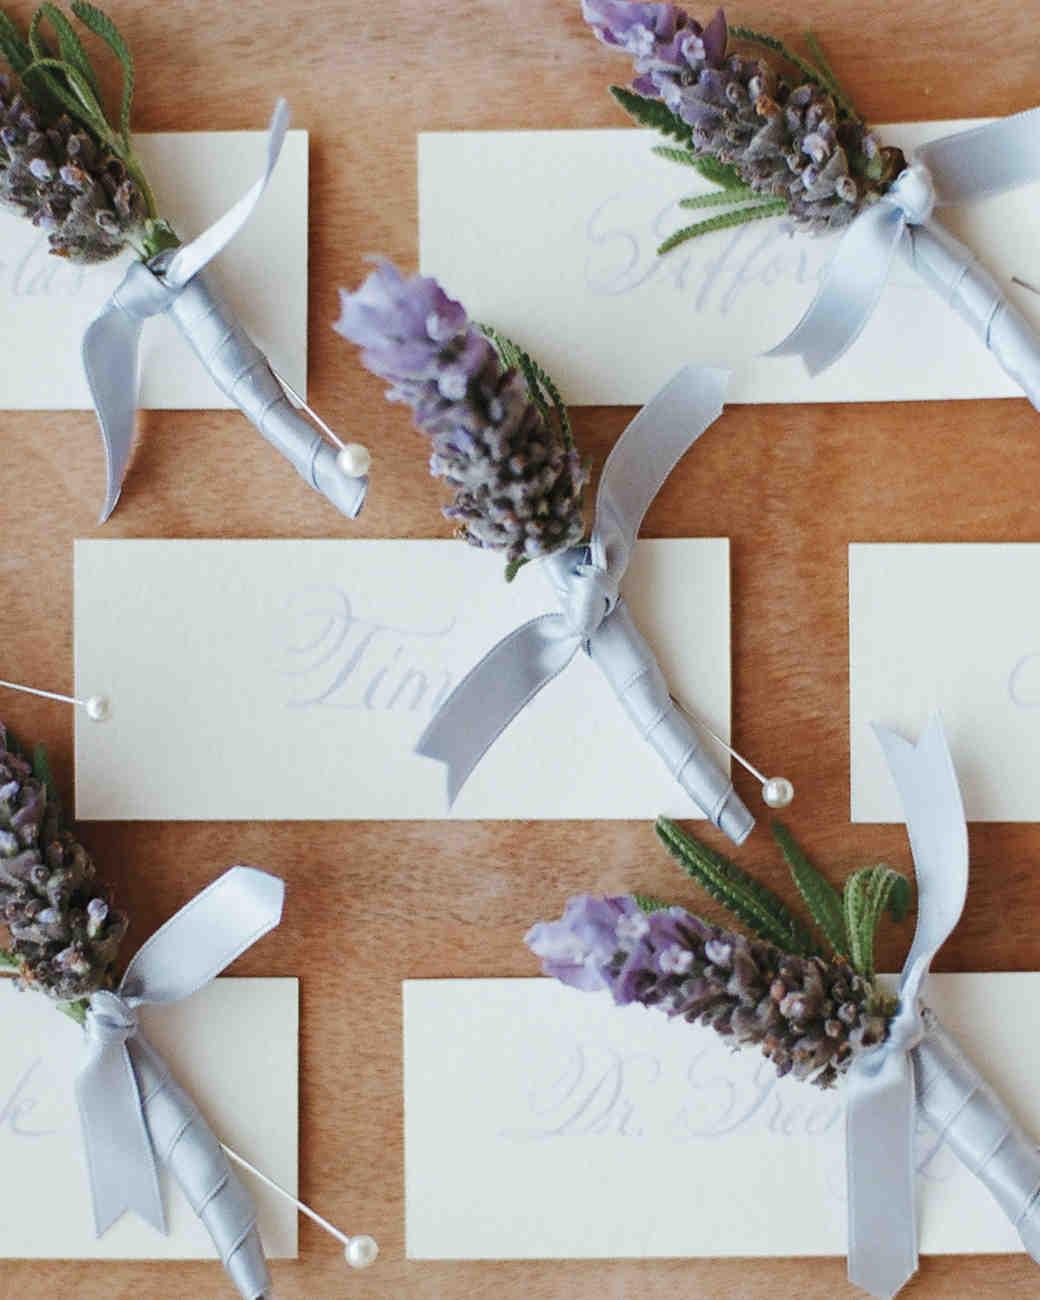 lavender-sprigs-mwds109983.jpg